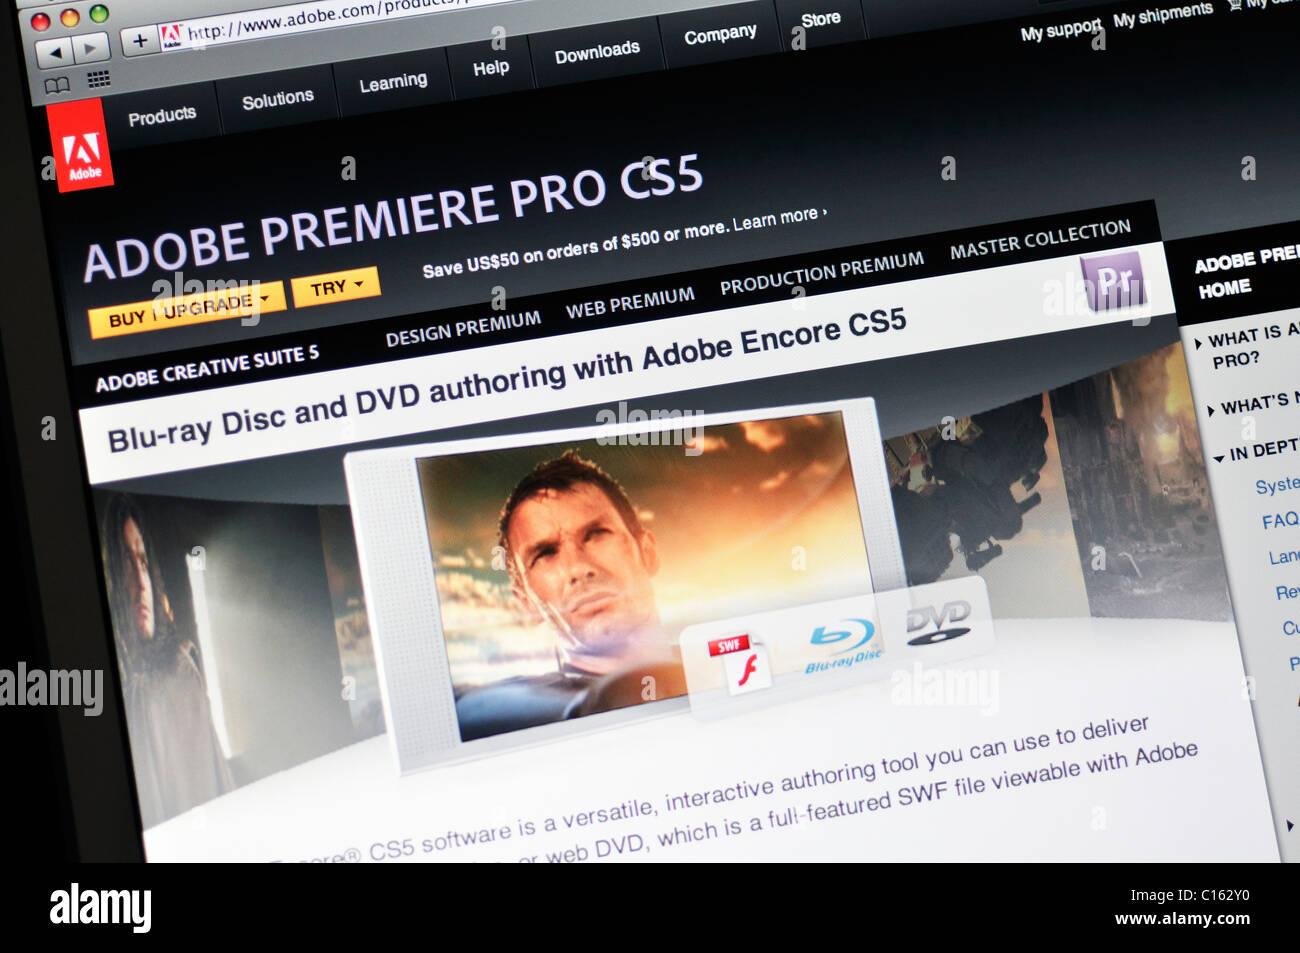 Adobe Premiere Pro CS5 website - Stock Image